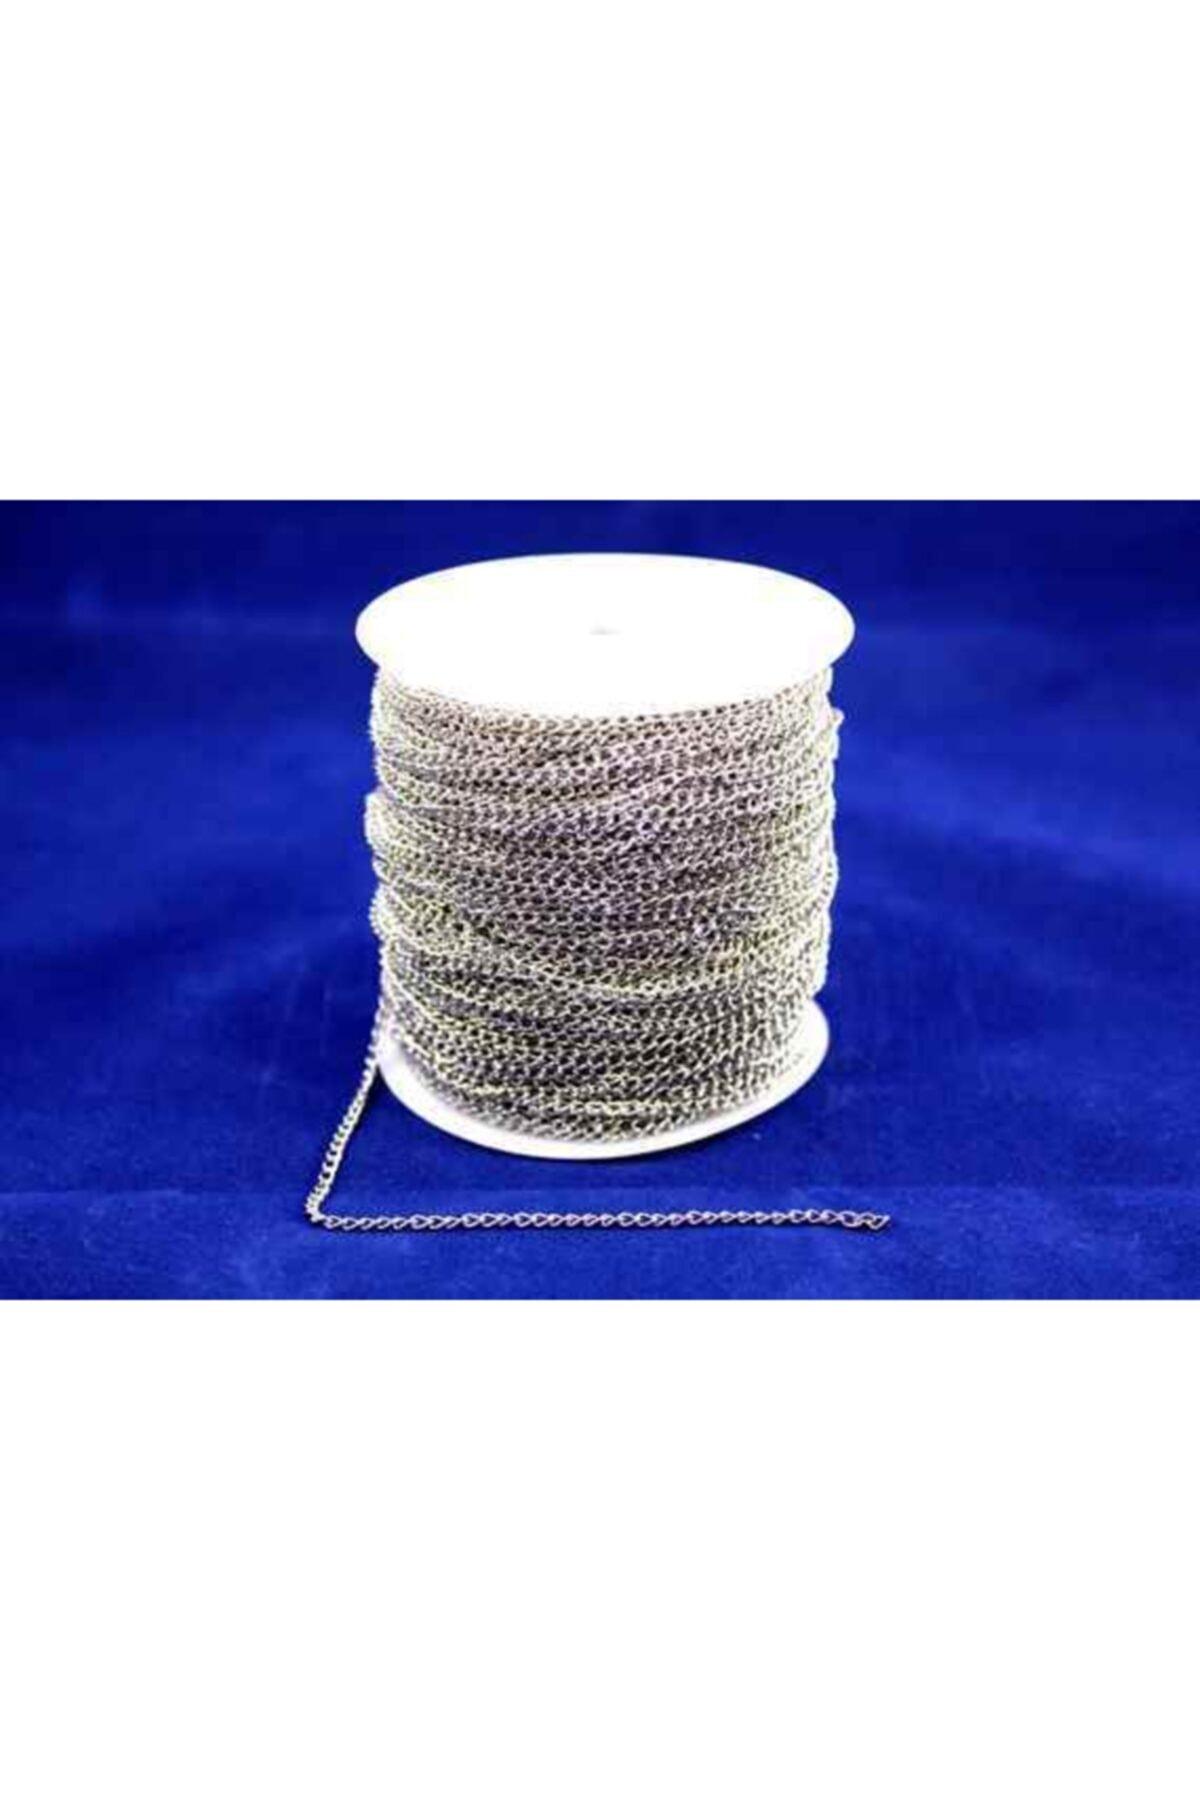 0.60 Mm Free Nikel Sac Kıvrık Zincir 10 Metre